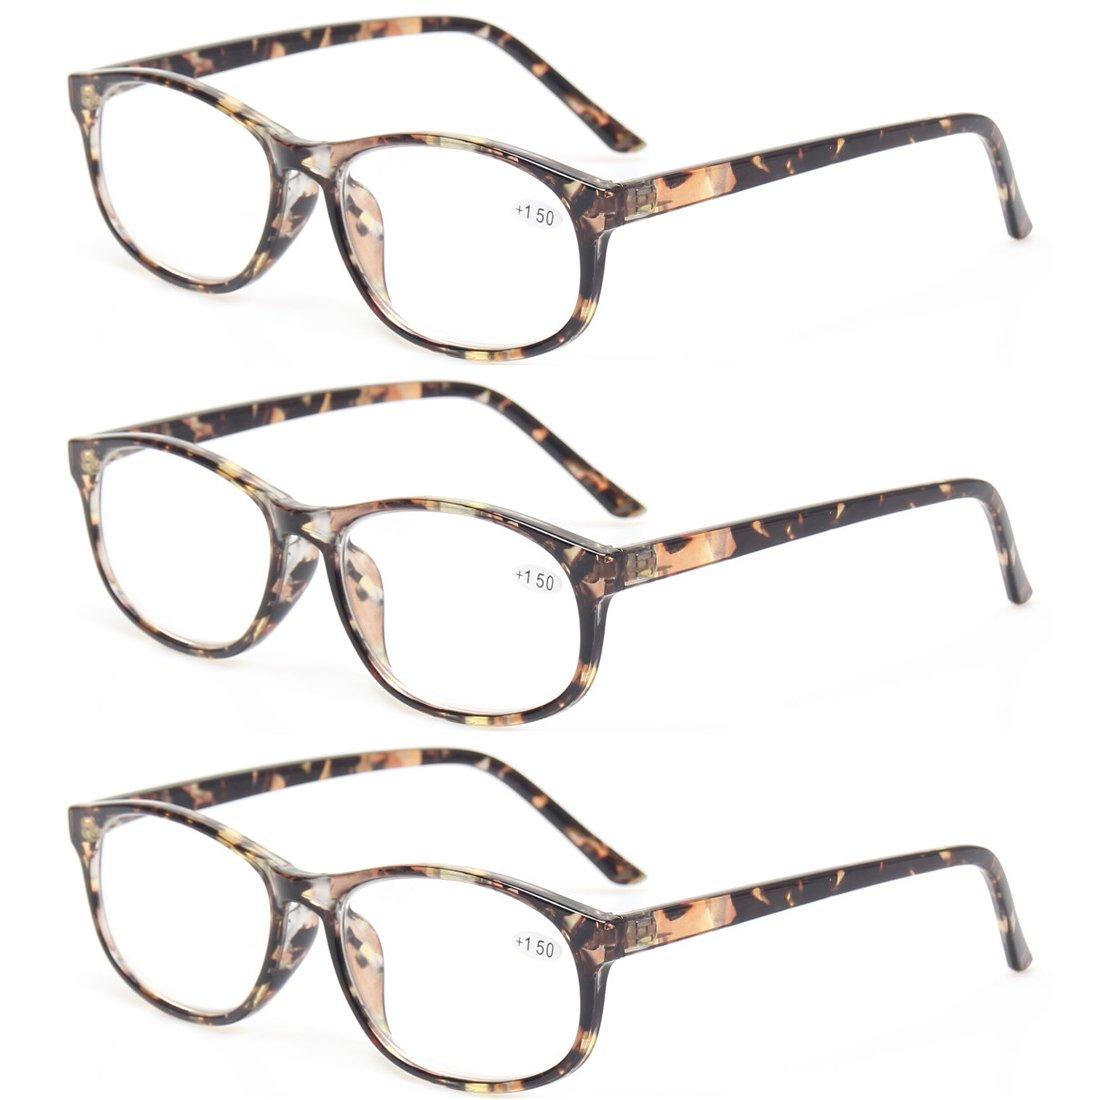 Kerecsen 3 Pack Fashion Men and Women Reading Glasses Stylish Designed Readers 0)